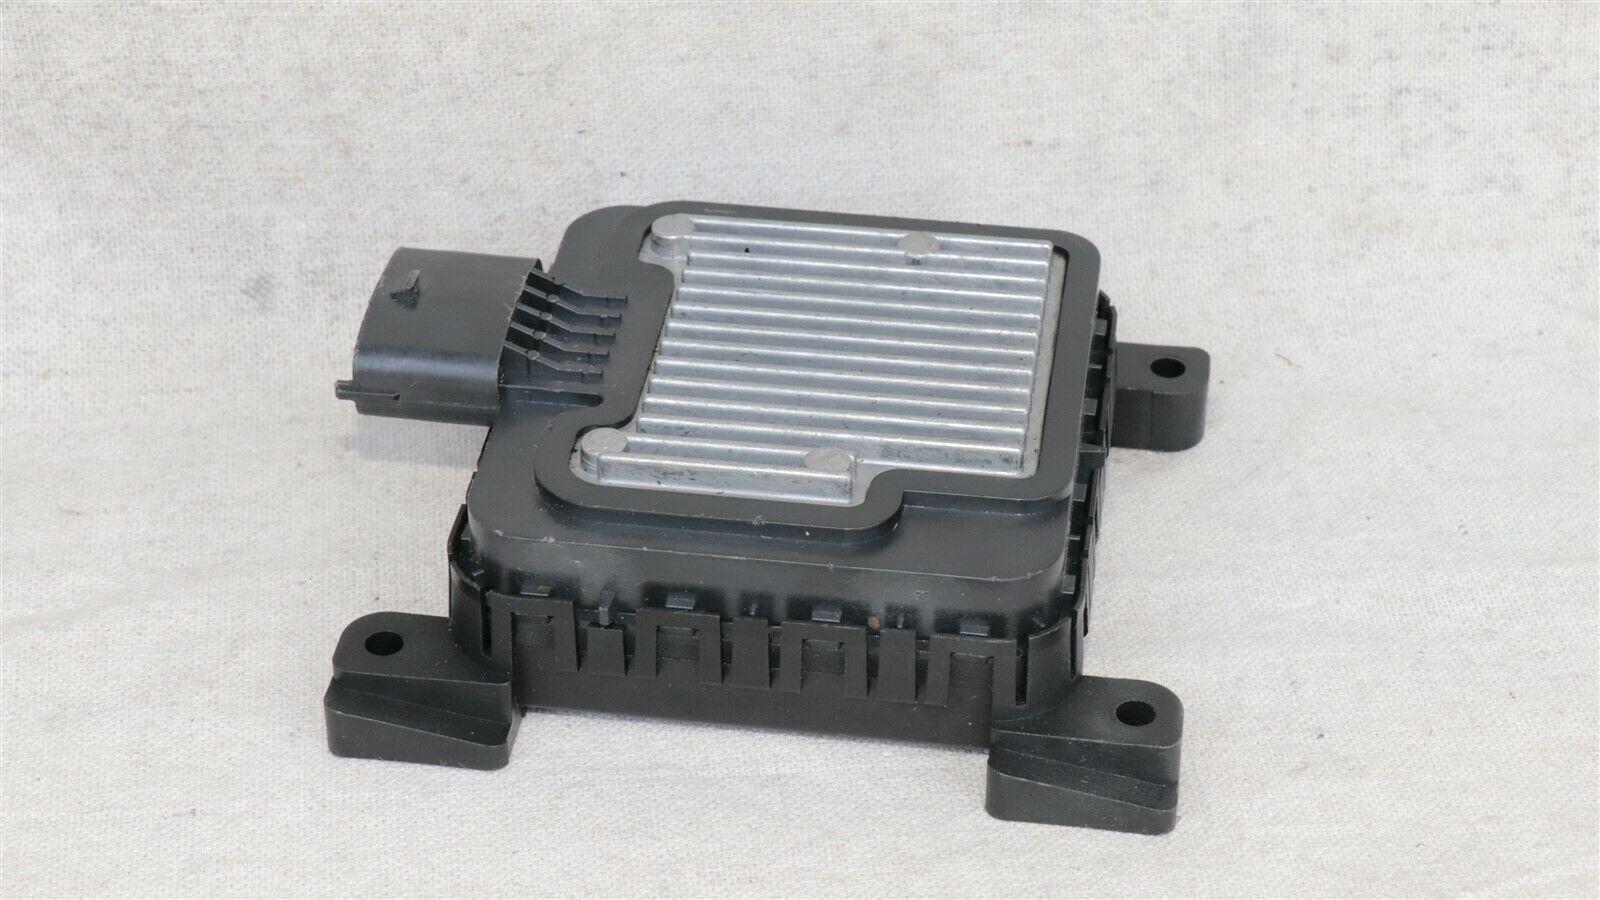 Volvo S40 S80 S60 V70 XC70 XC90 Fuel Pump Control Module 4N5T-9C105-AG, 30769225